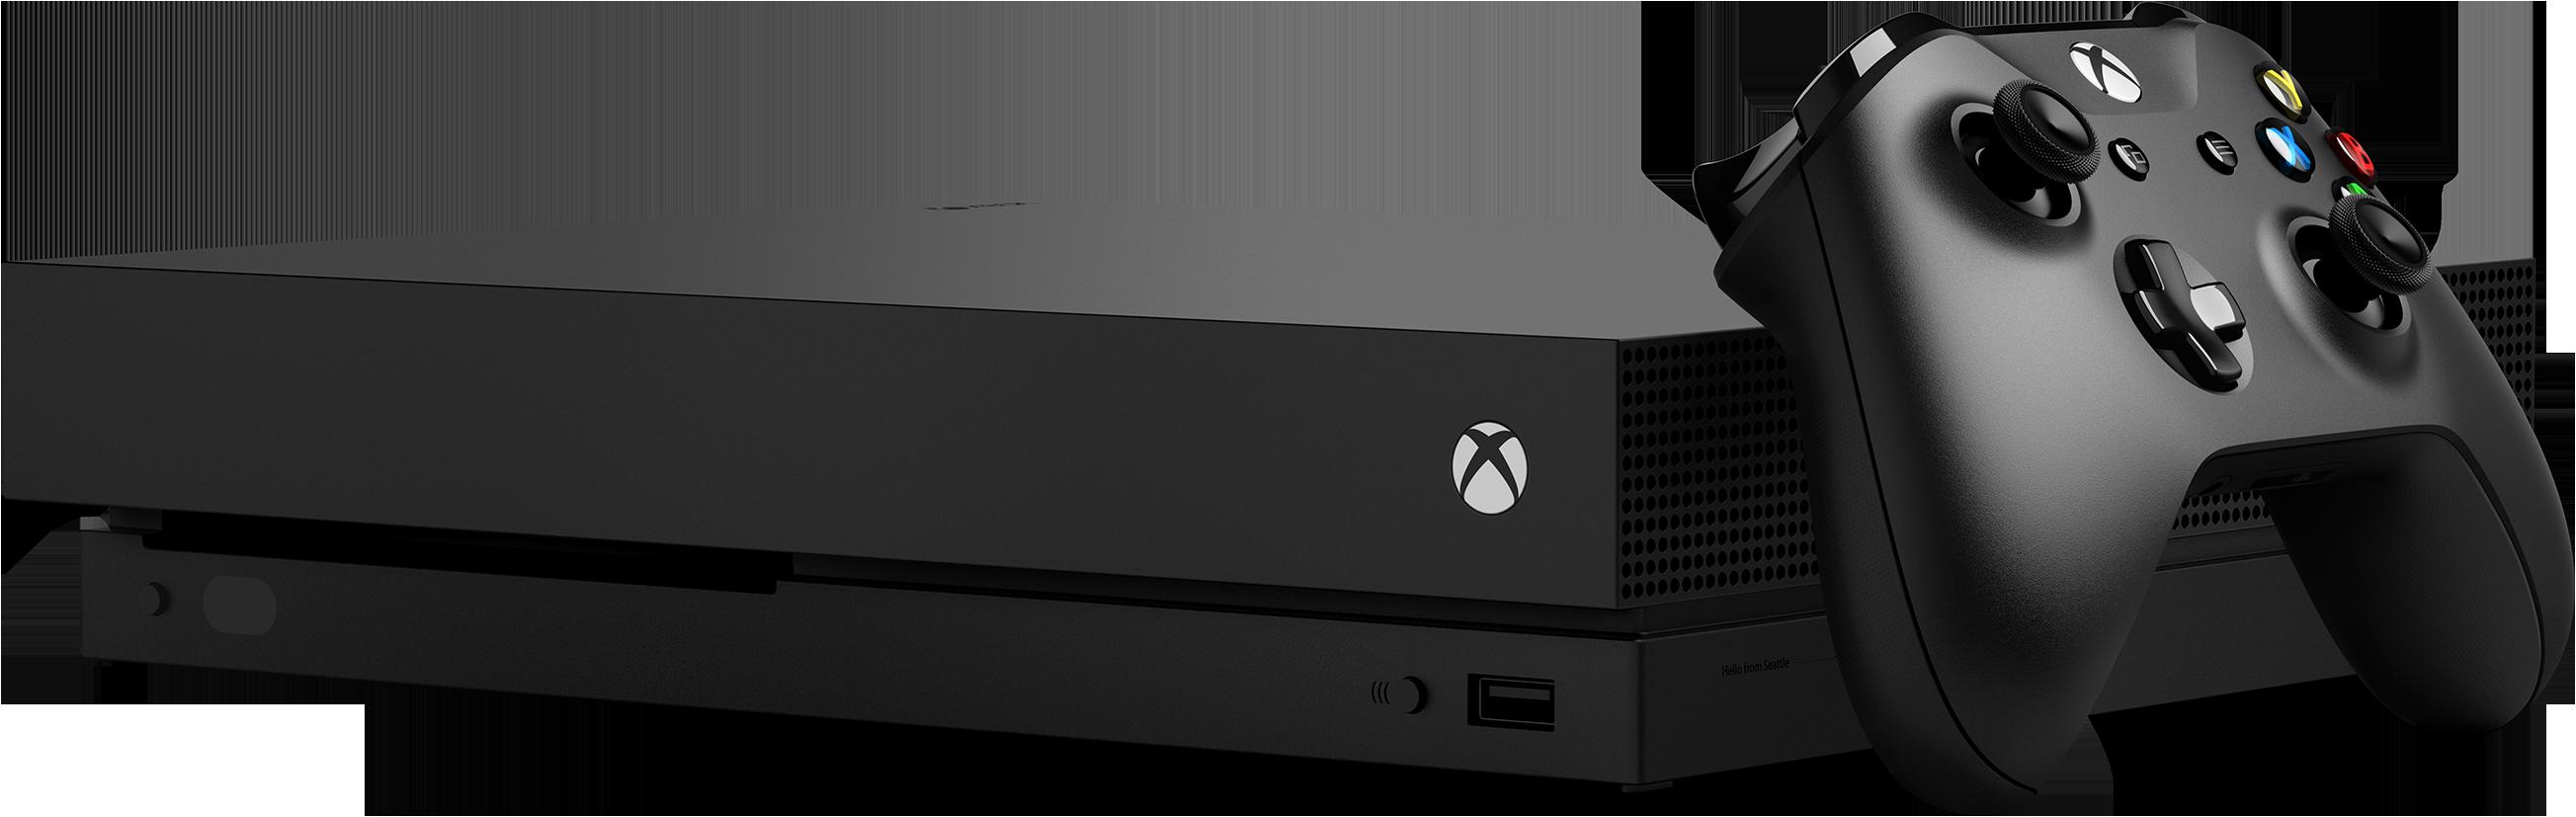 RWbGIz?ver=8530 - Xbox One X 1TB Console